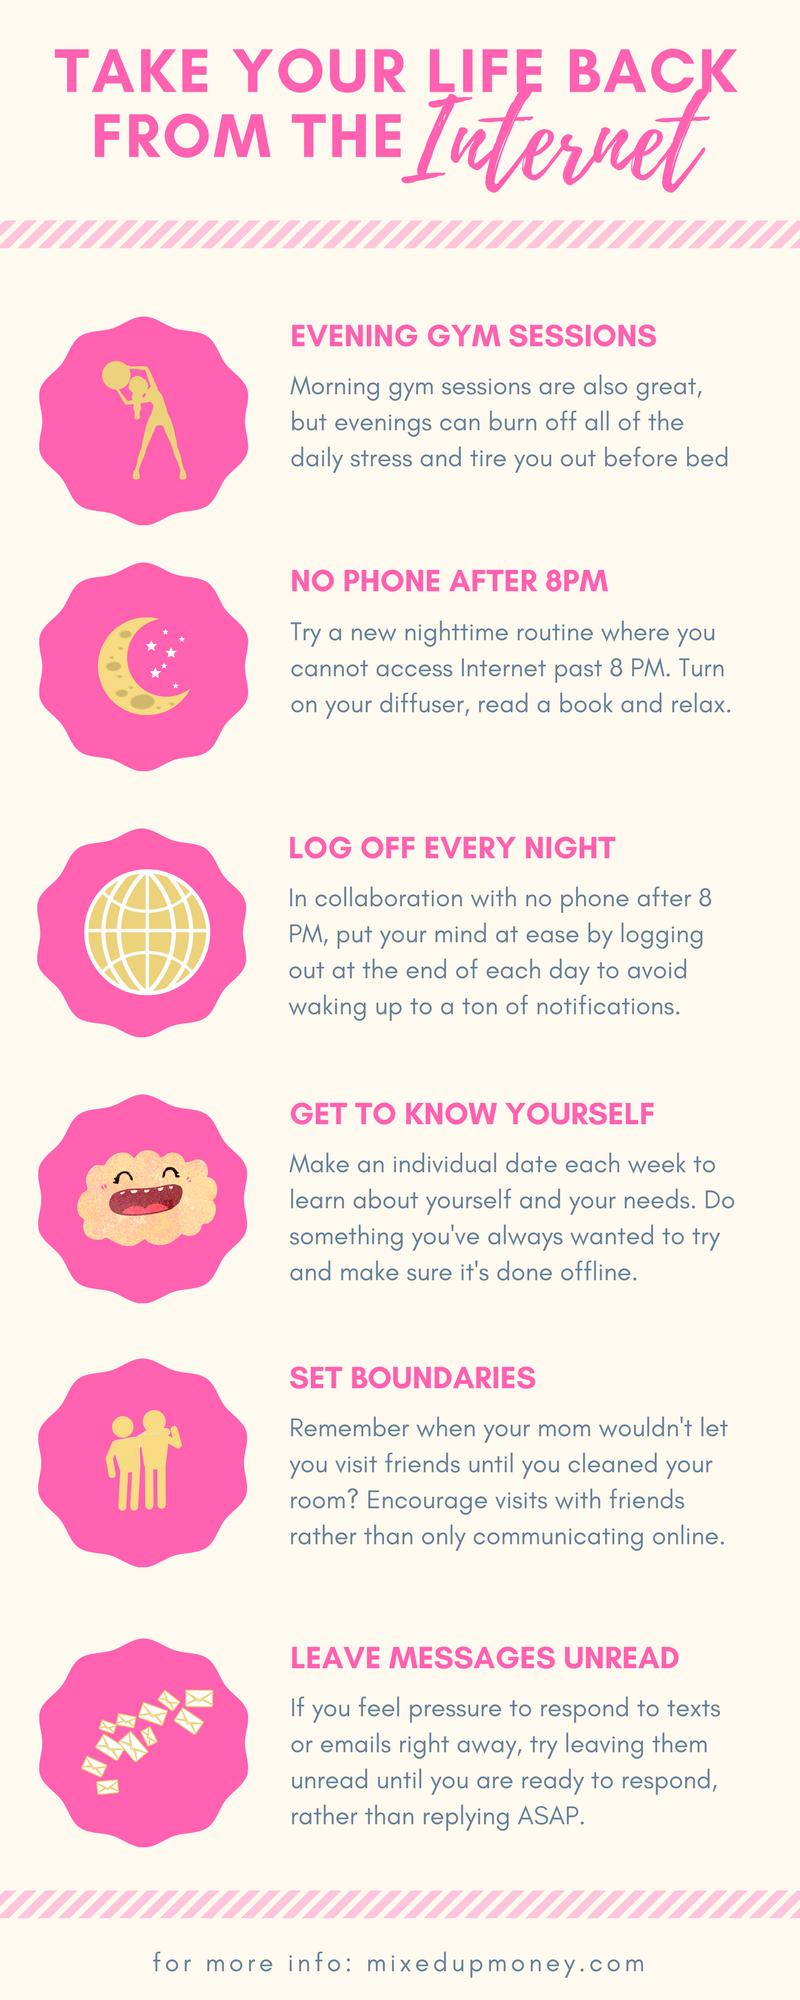 infographic-break-from-internet